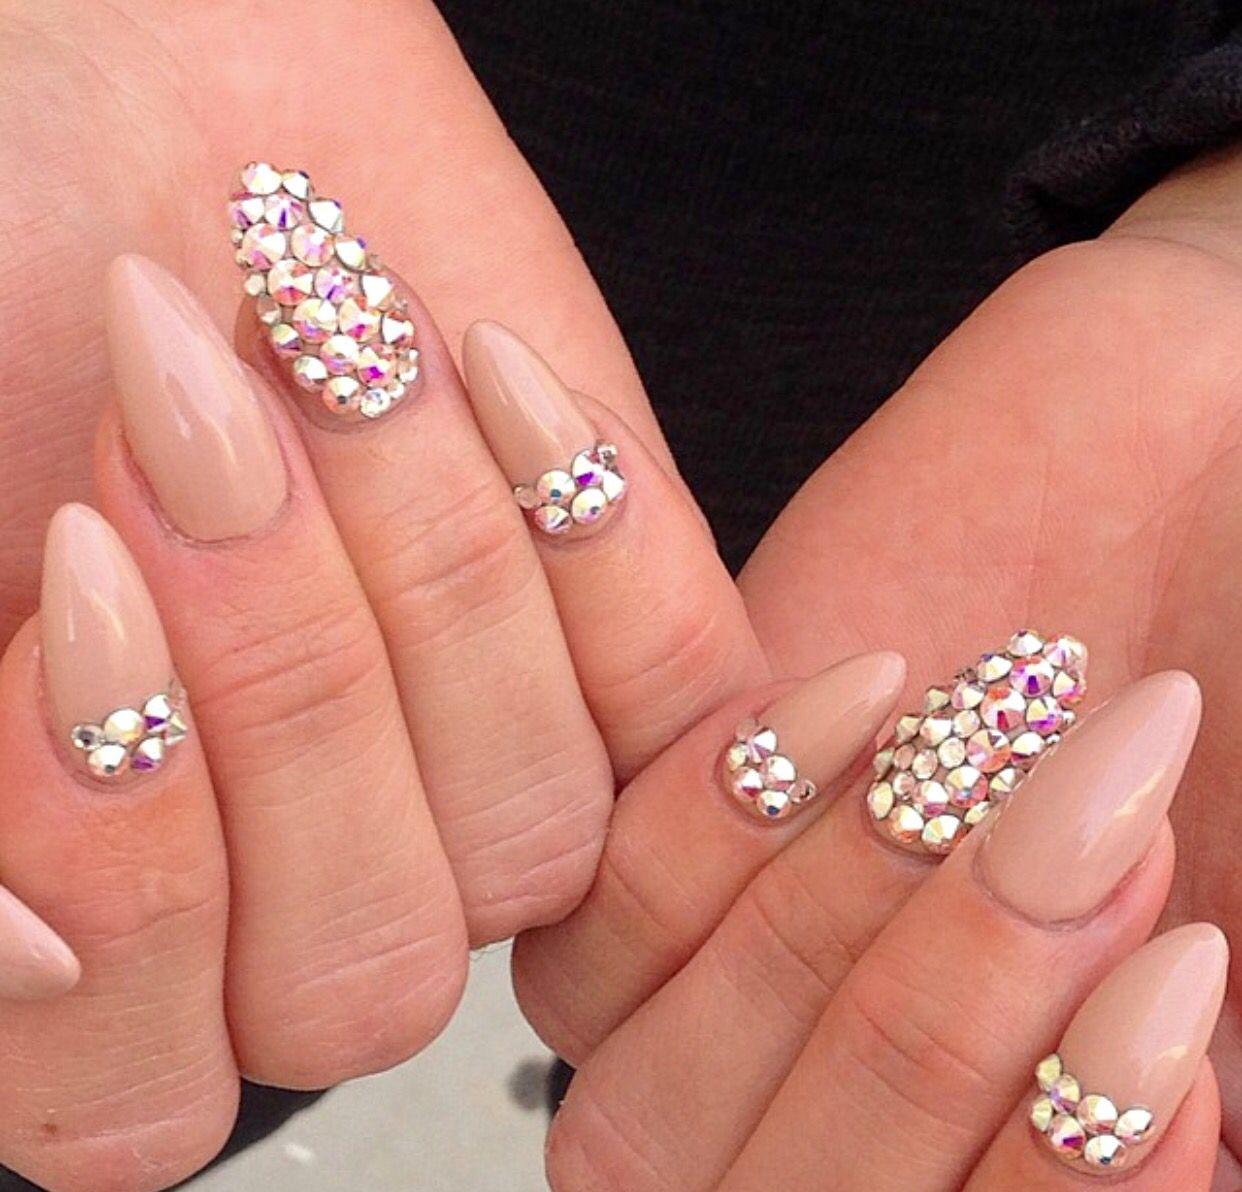 Pin van Michelle DH op Nails yayah!